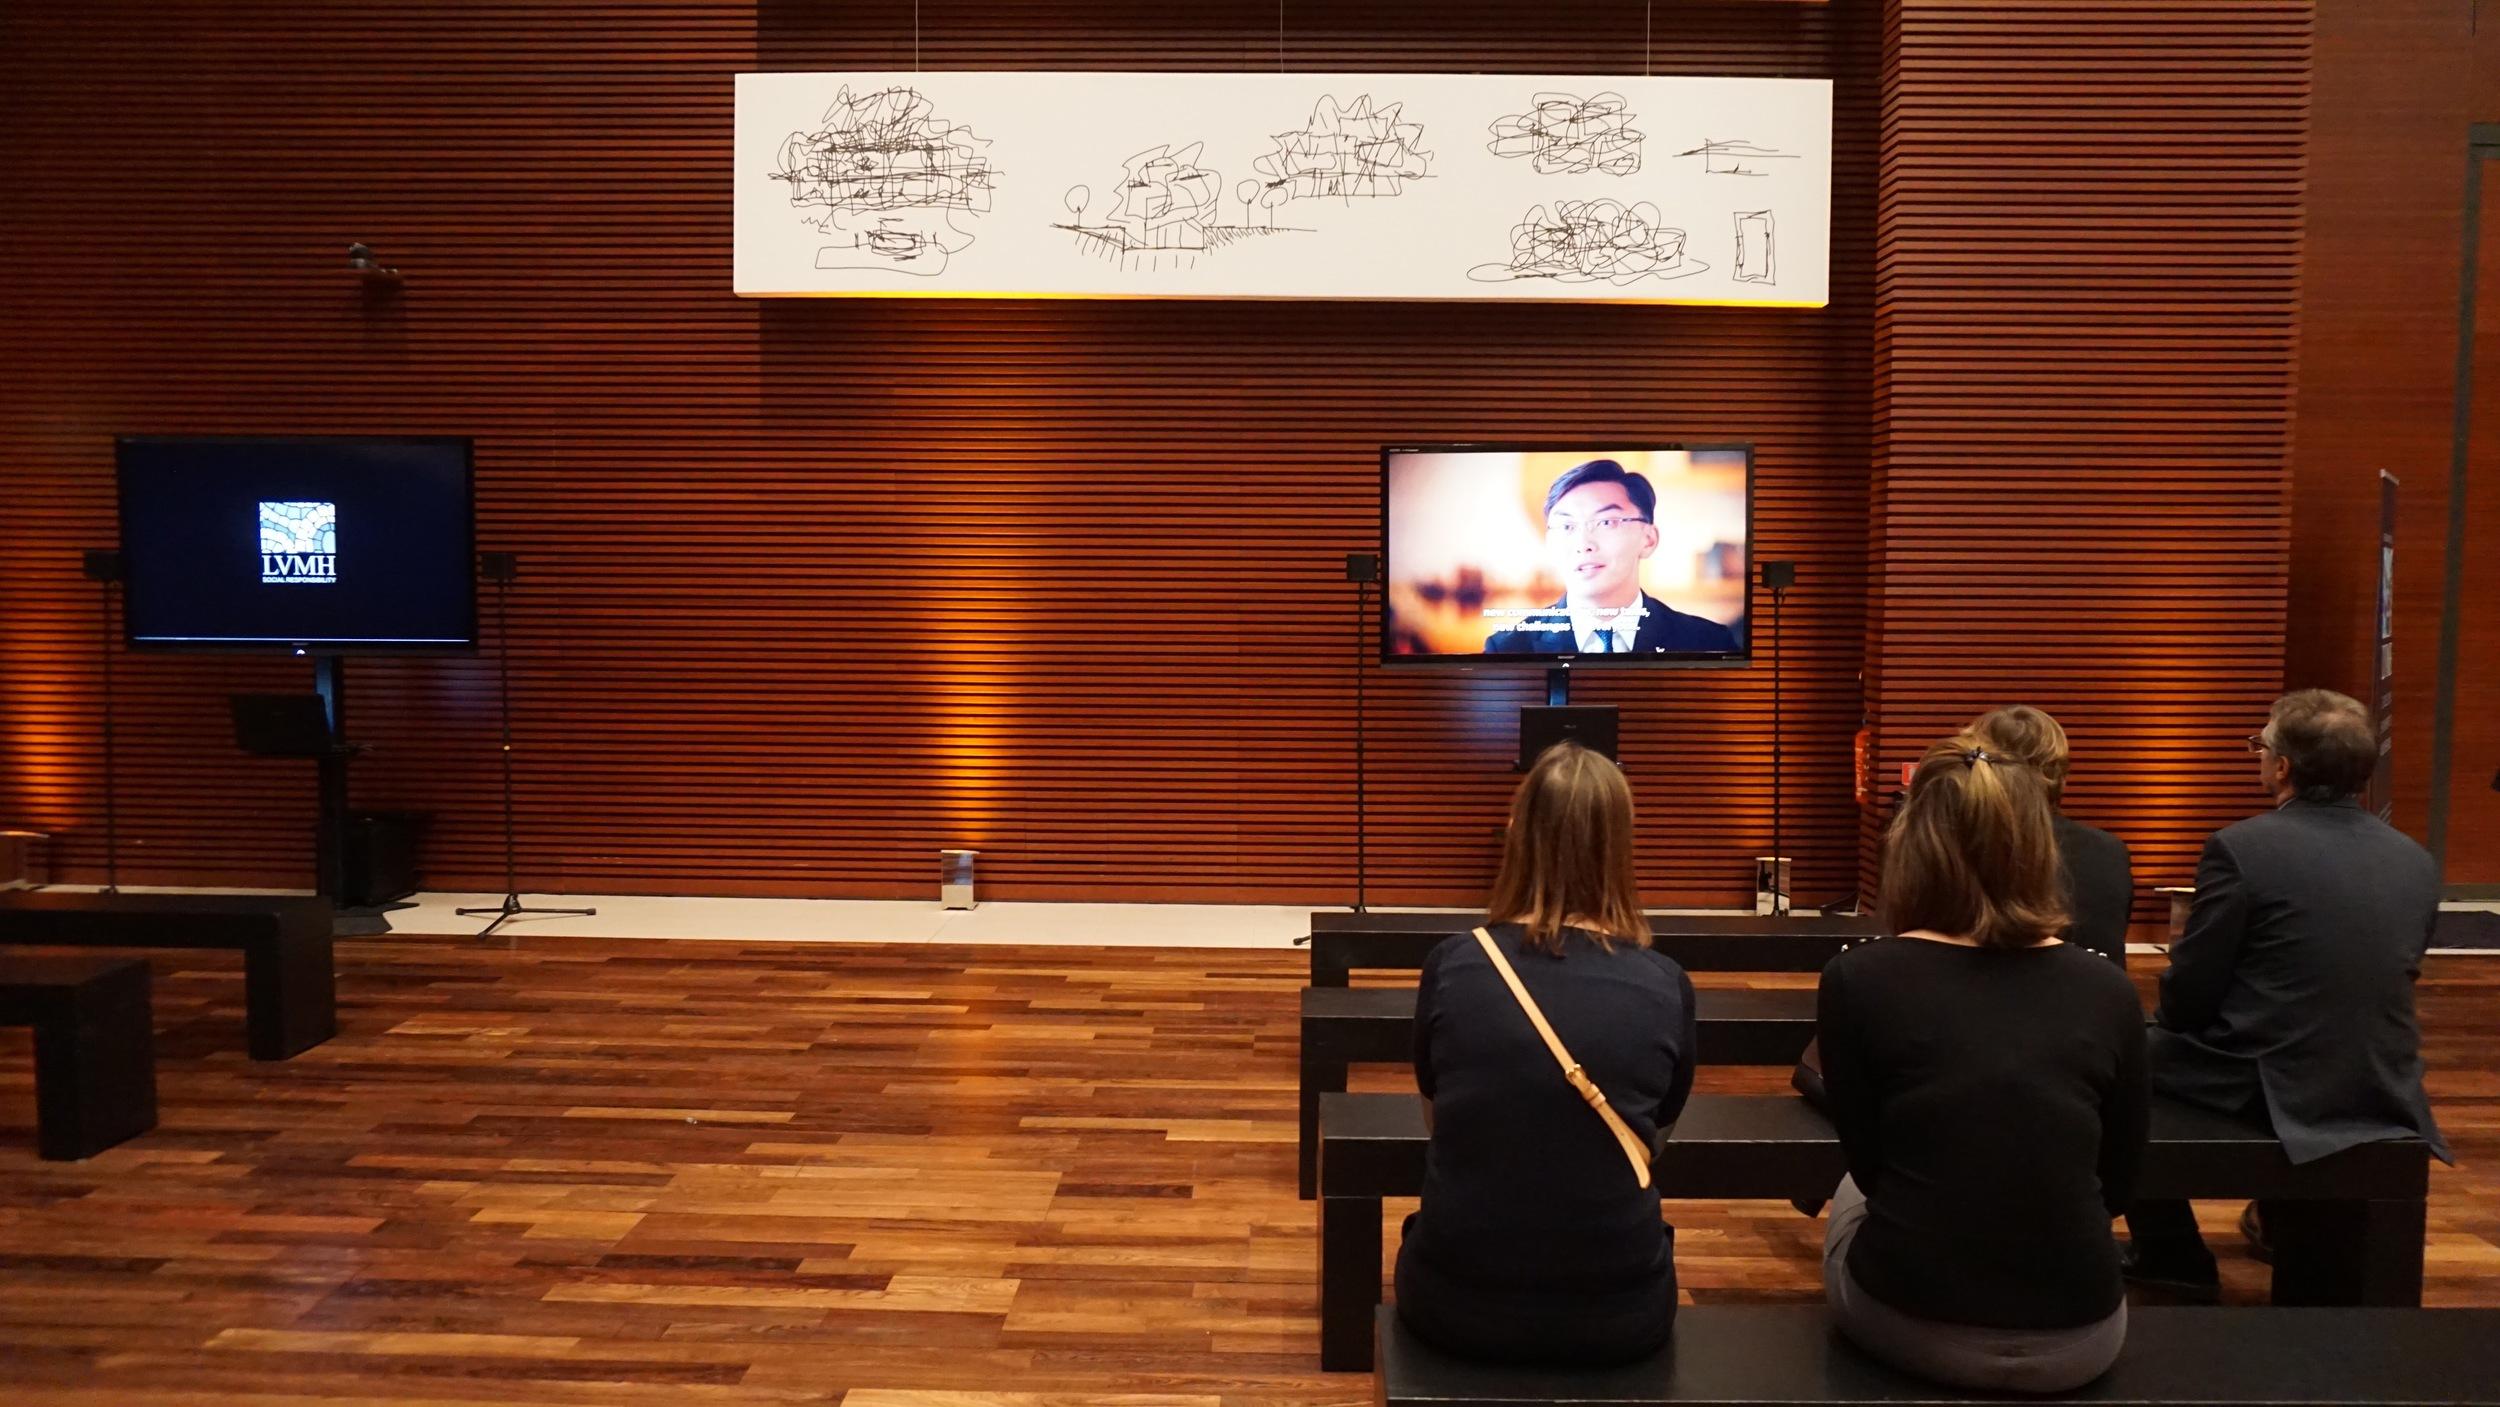 Film screening at the LVMH Headquarters